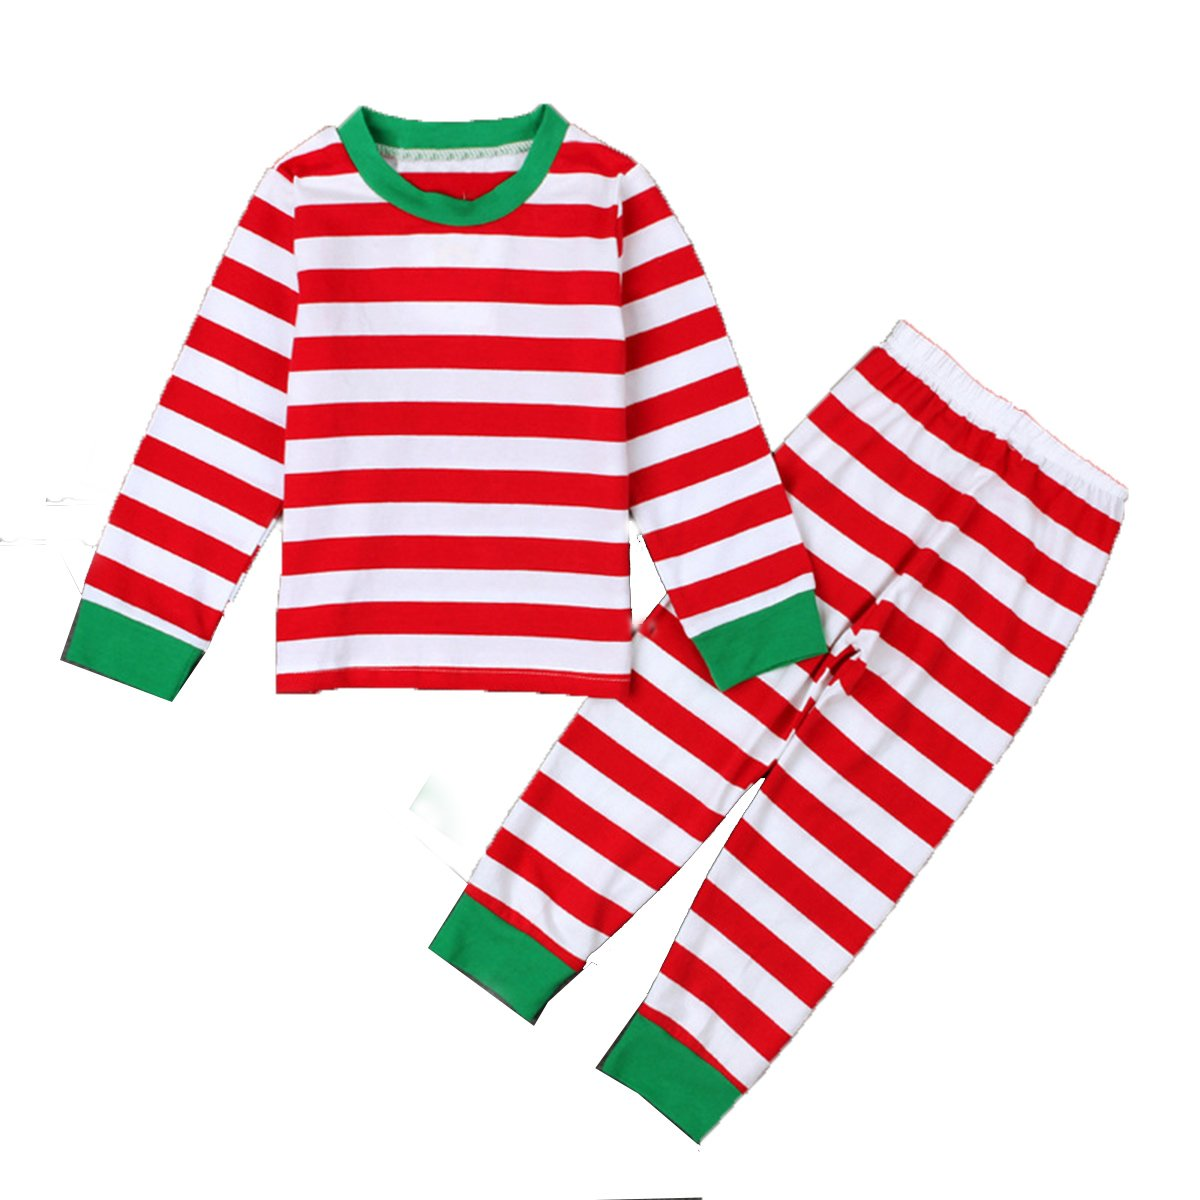 Baby Boys Girls Striped Christmas Nightwear Pajamas Sleepwear T-shirt and Pants Set